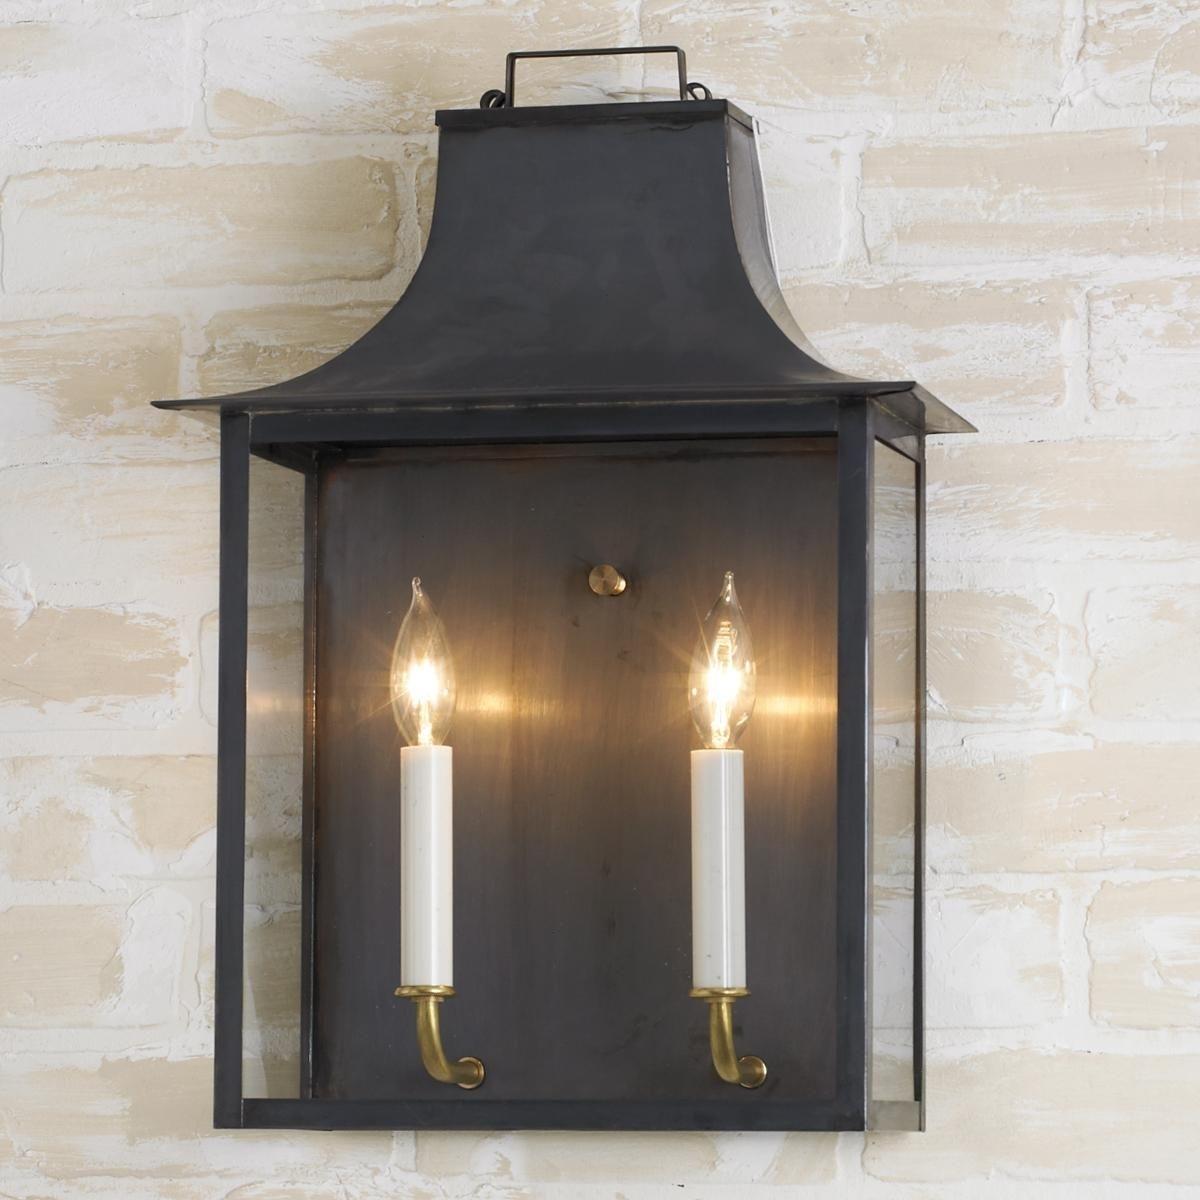 Lighting : Outdoor Lighting Fixtures Pretty Lowes Post Hanging Light For Menards Outdoor Hanging Lights (View 9 of 15)